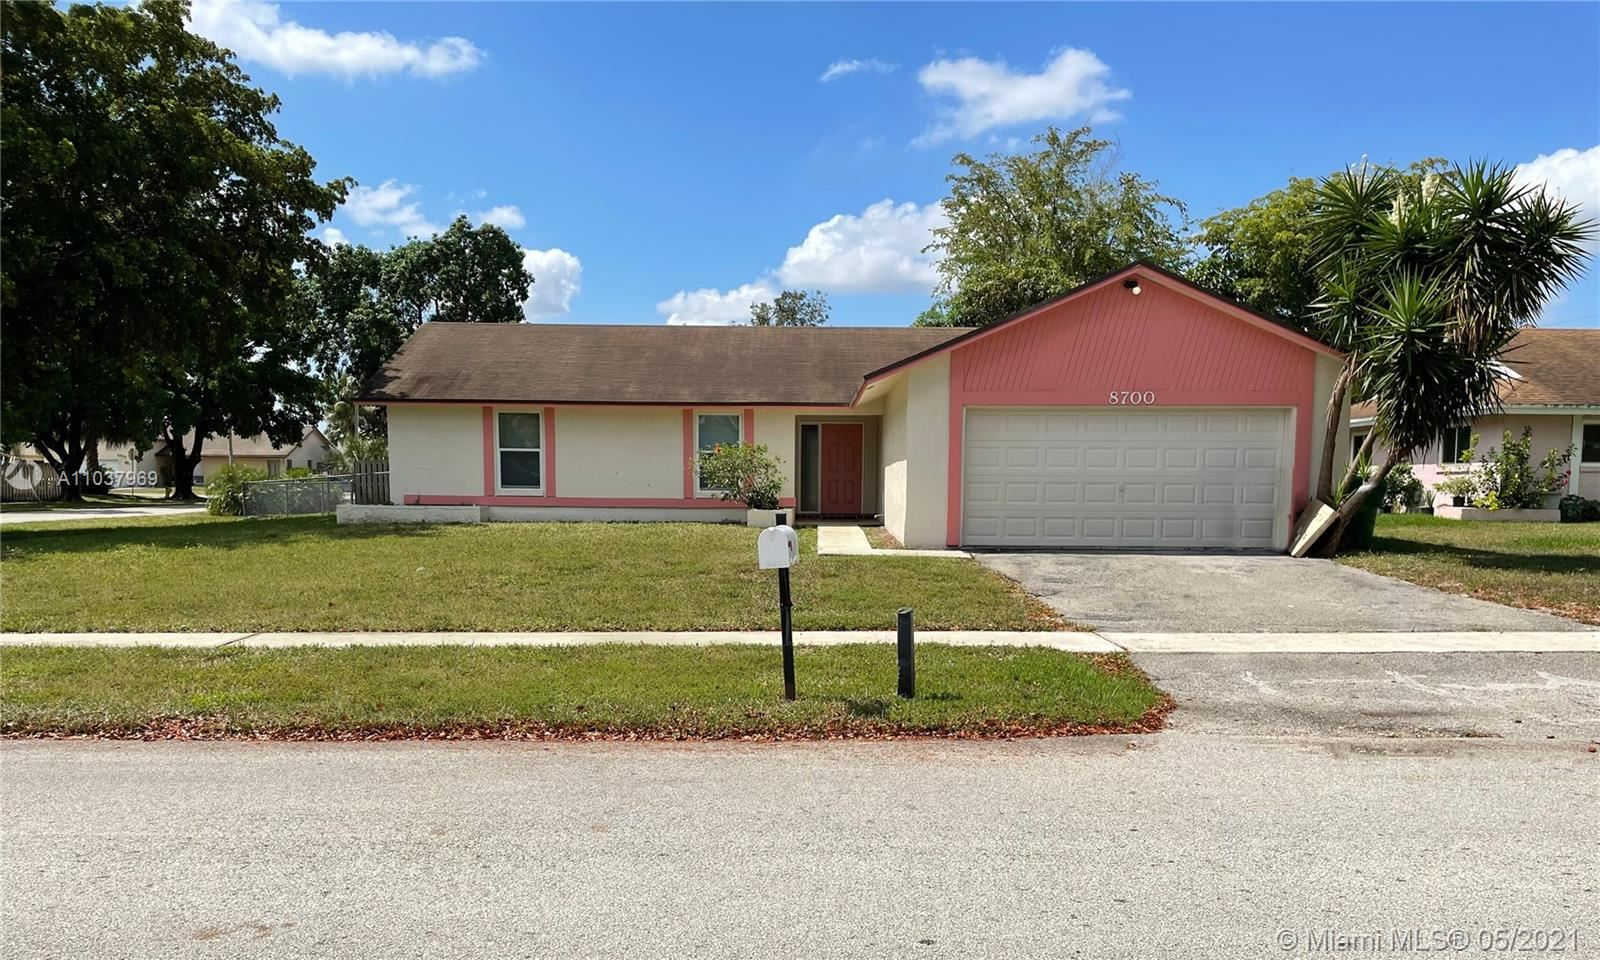 Photo of 8700 NW 48th St, Lauderhill, FL 33351 (MLS # A11037969)